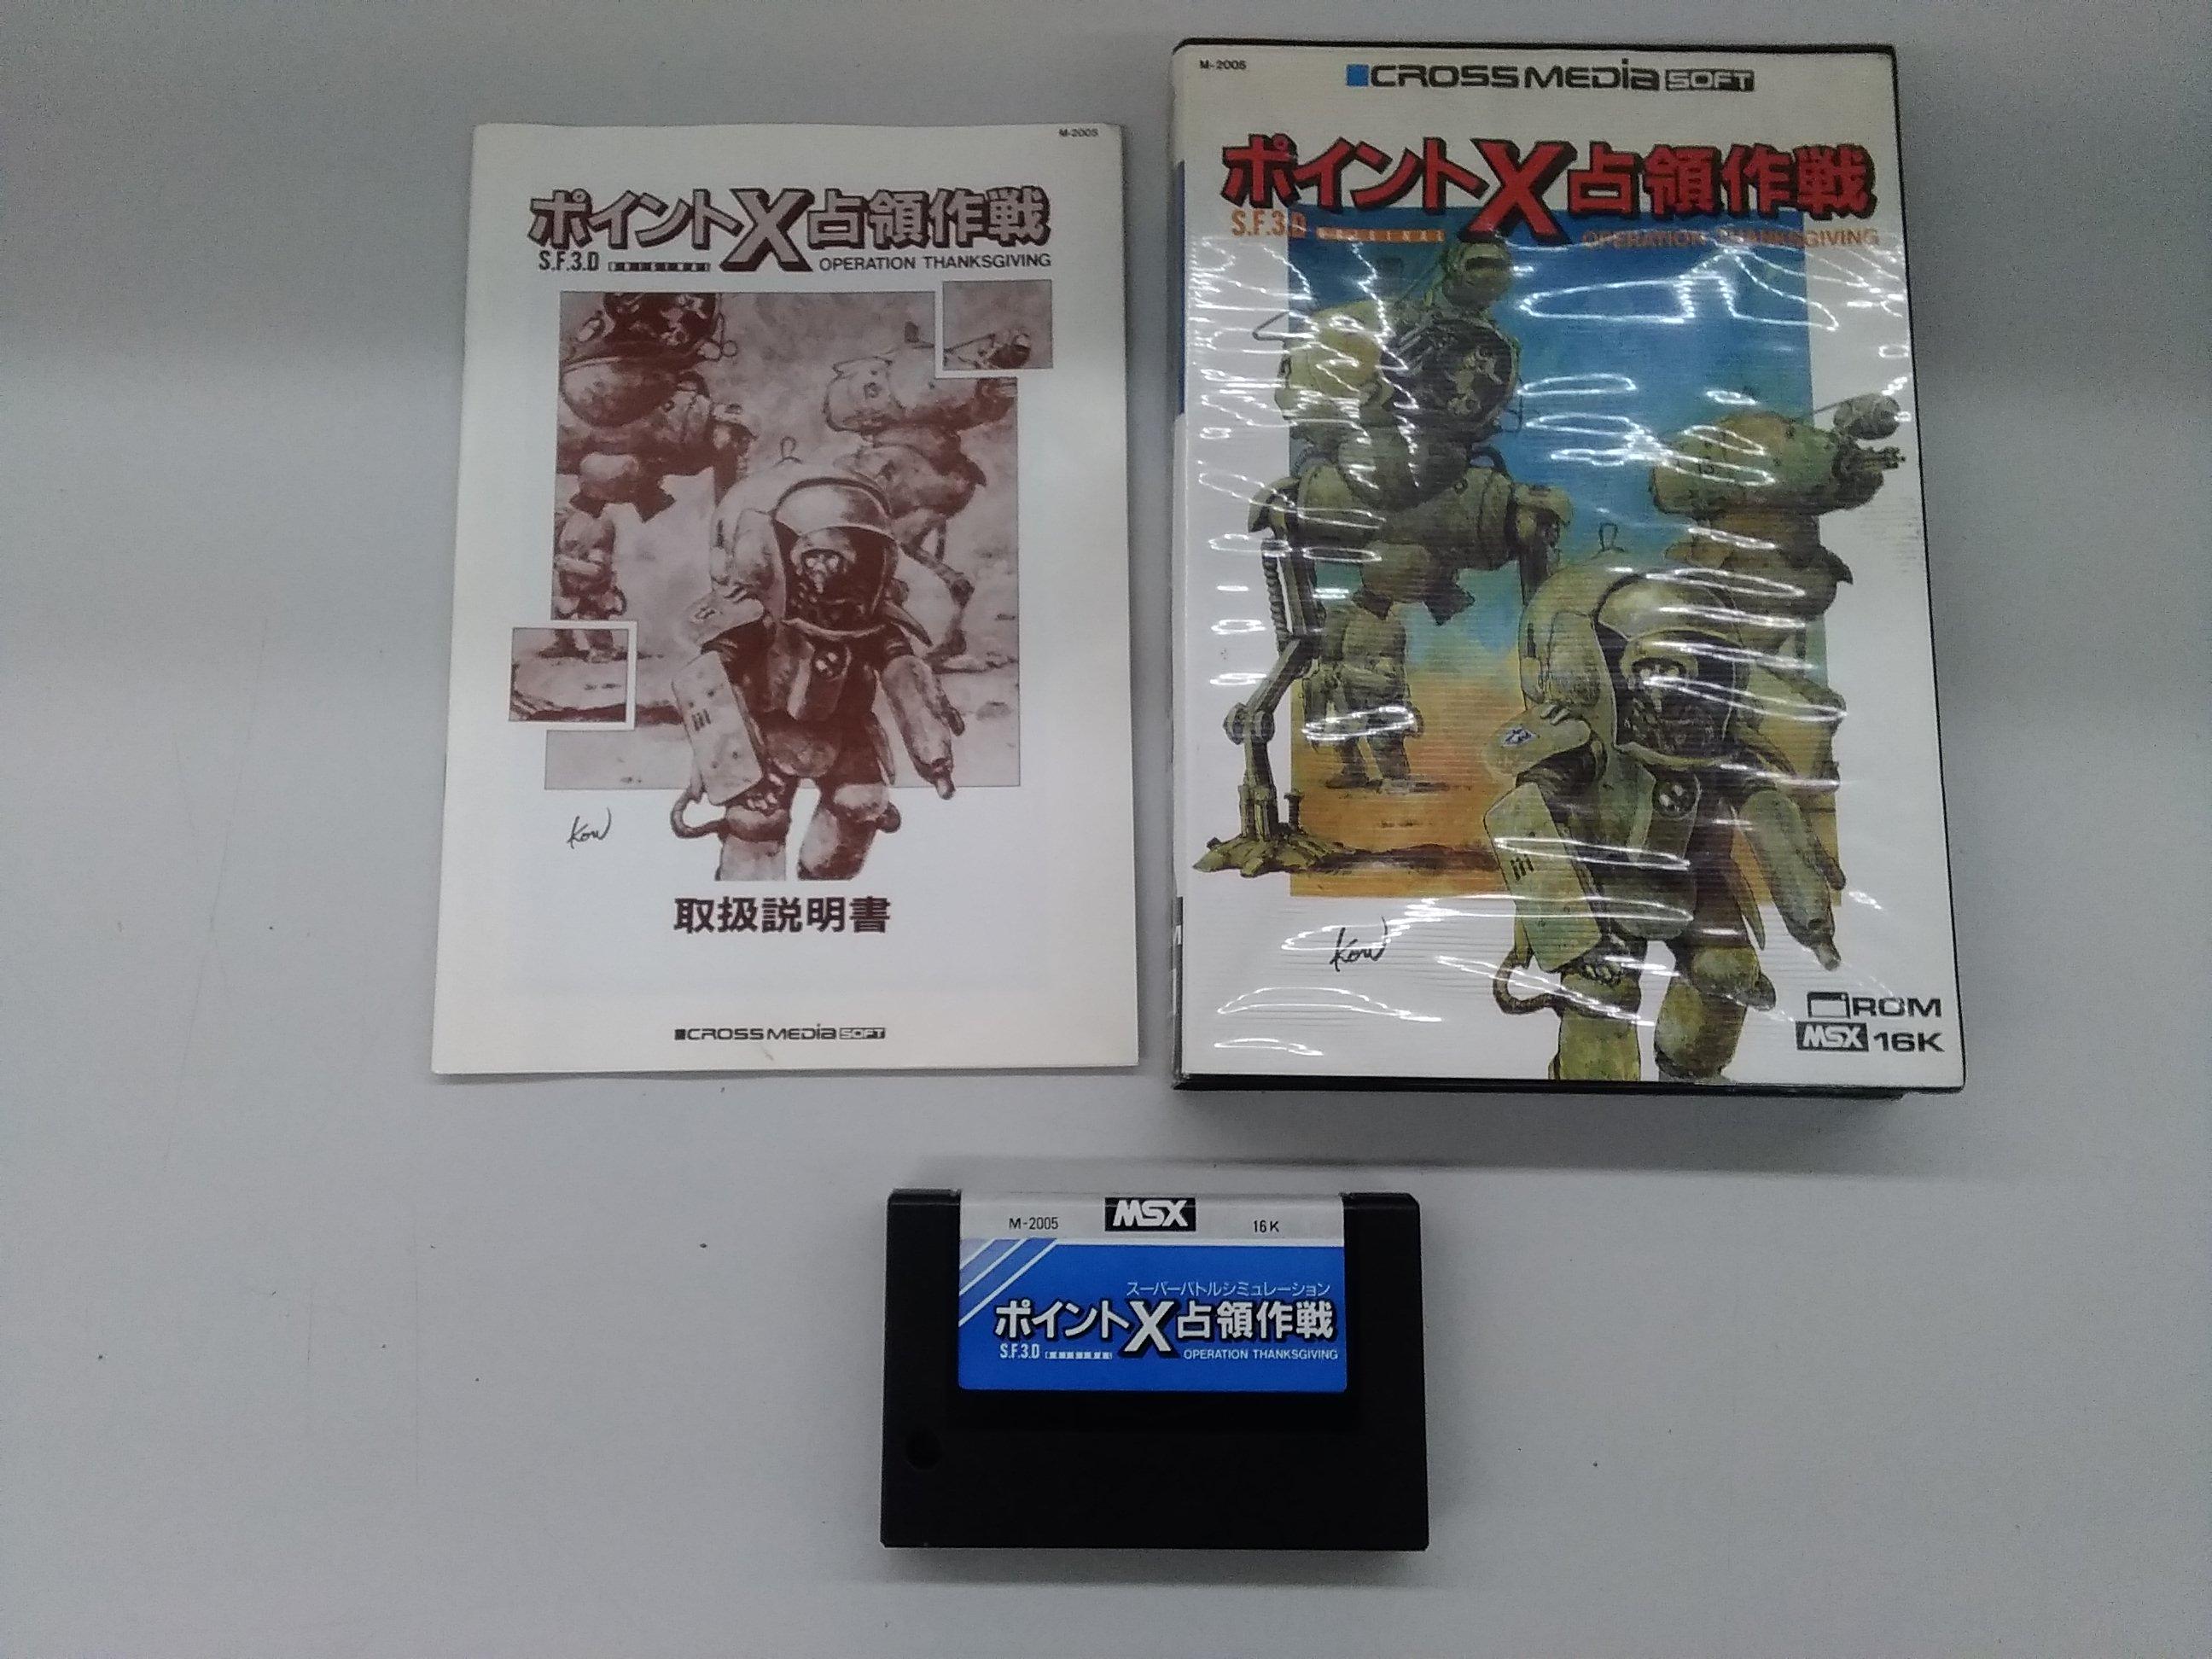 MSXソフト ポイントX占領作戦|VICTOR